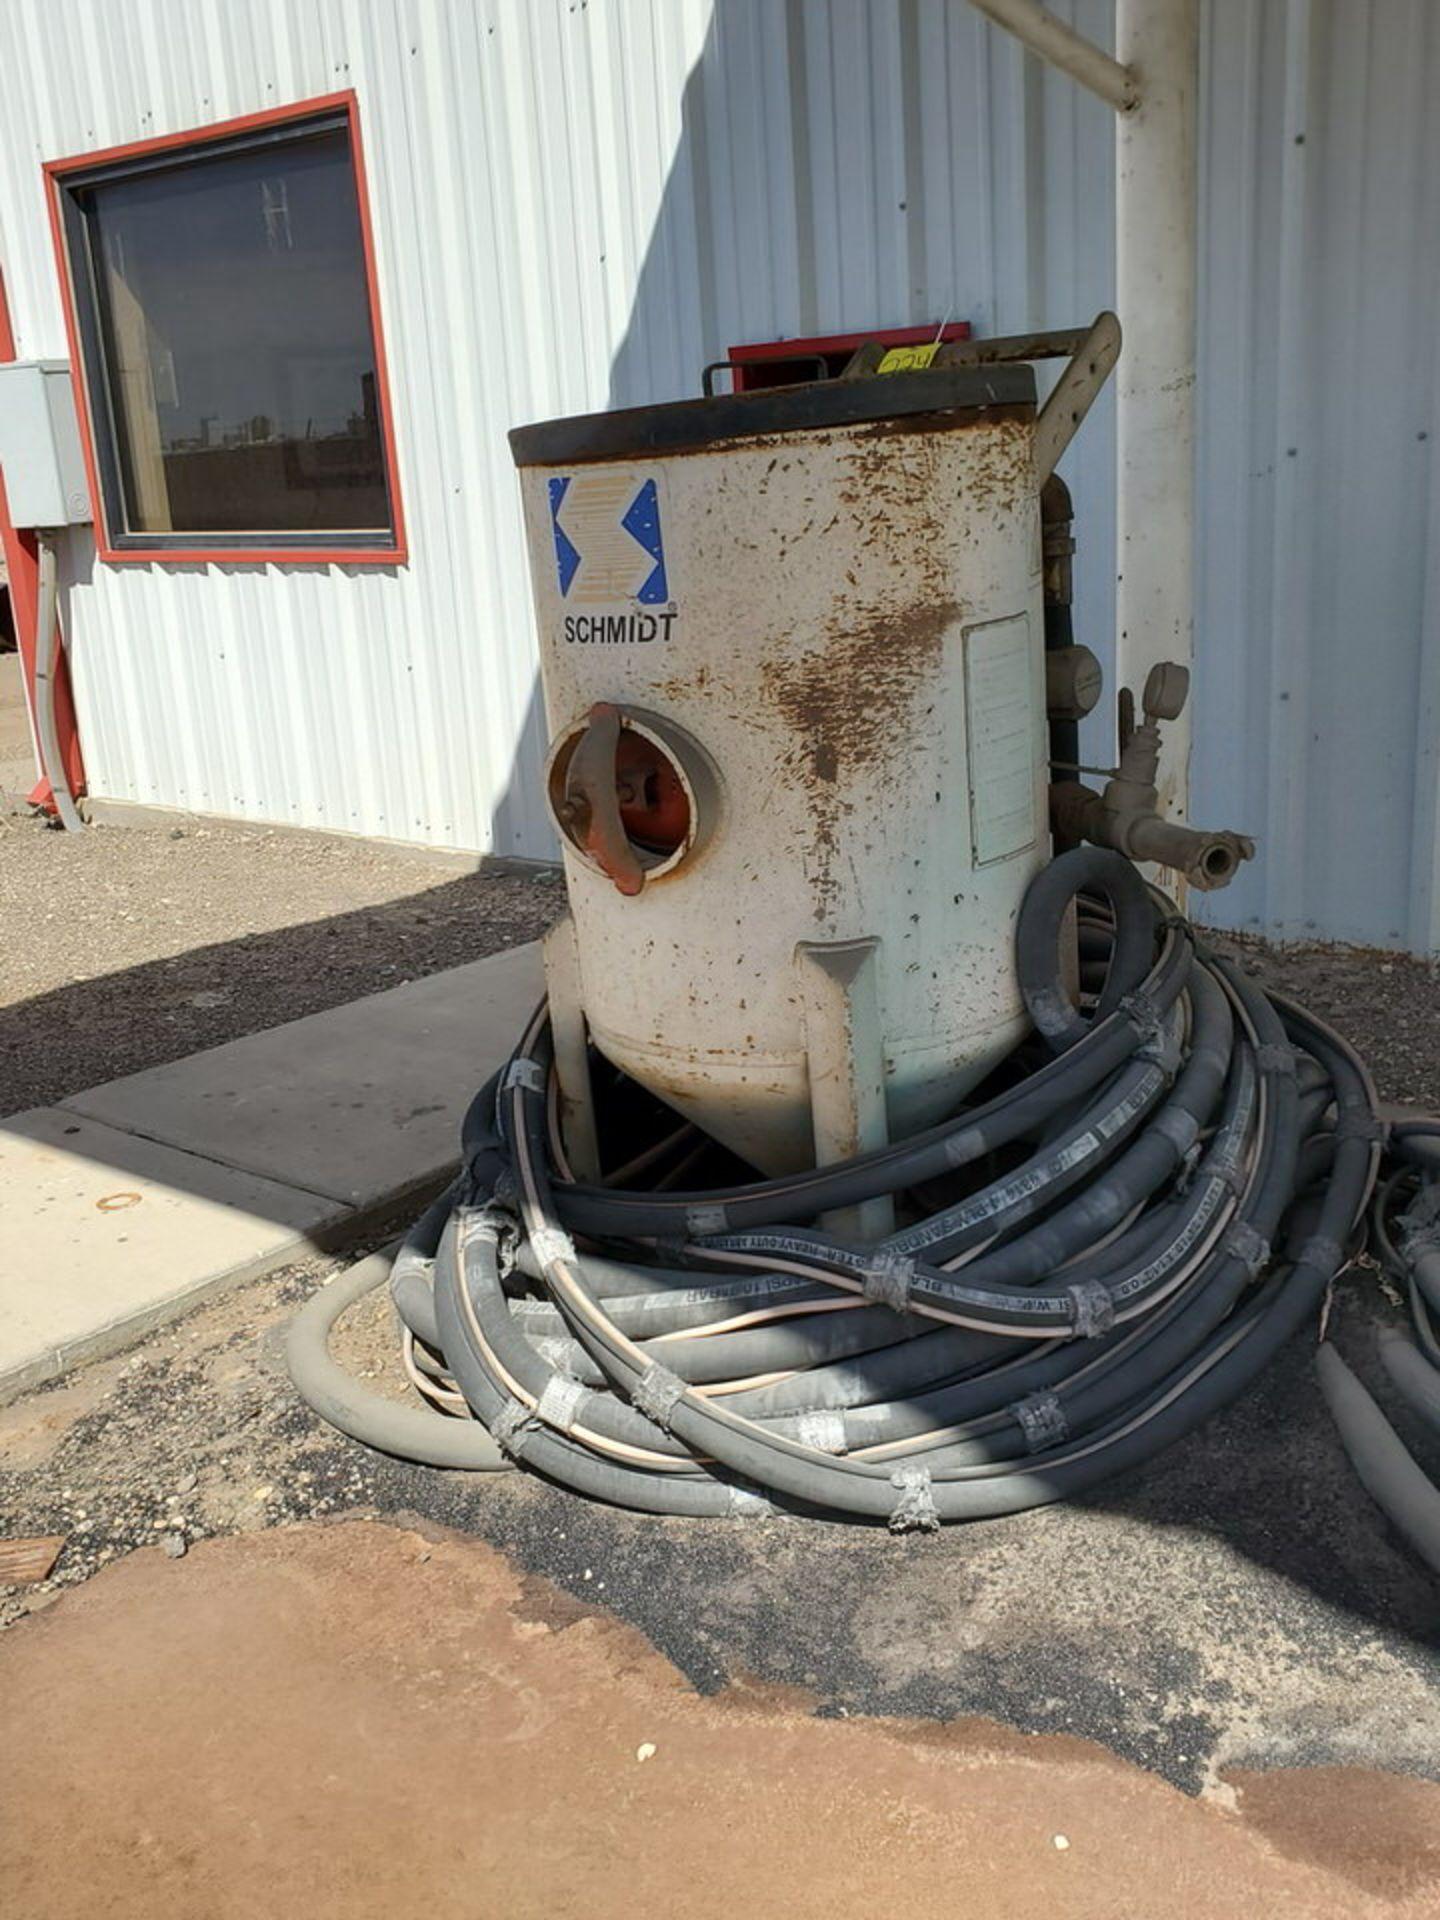 Schmidt 12' Portable Abrasive Sand Blaster Pot 150psi@250F, -20F@150psi; NB# 10649